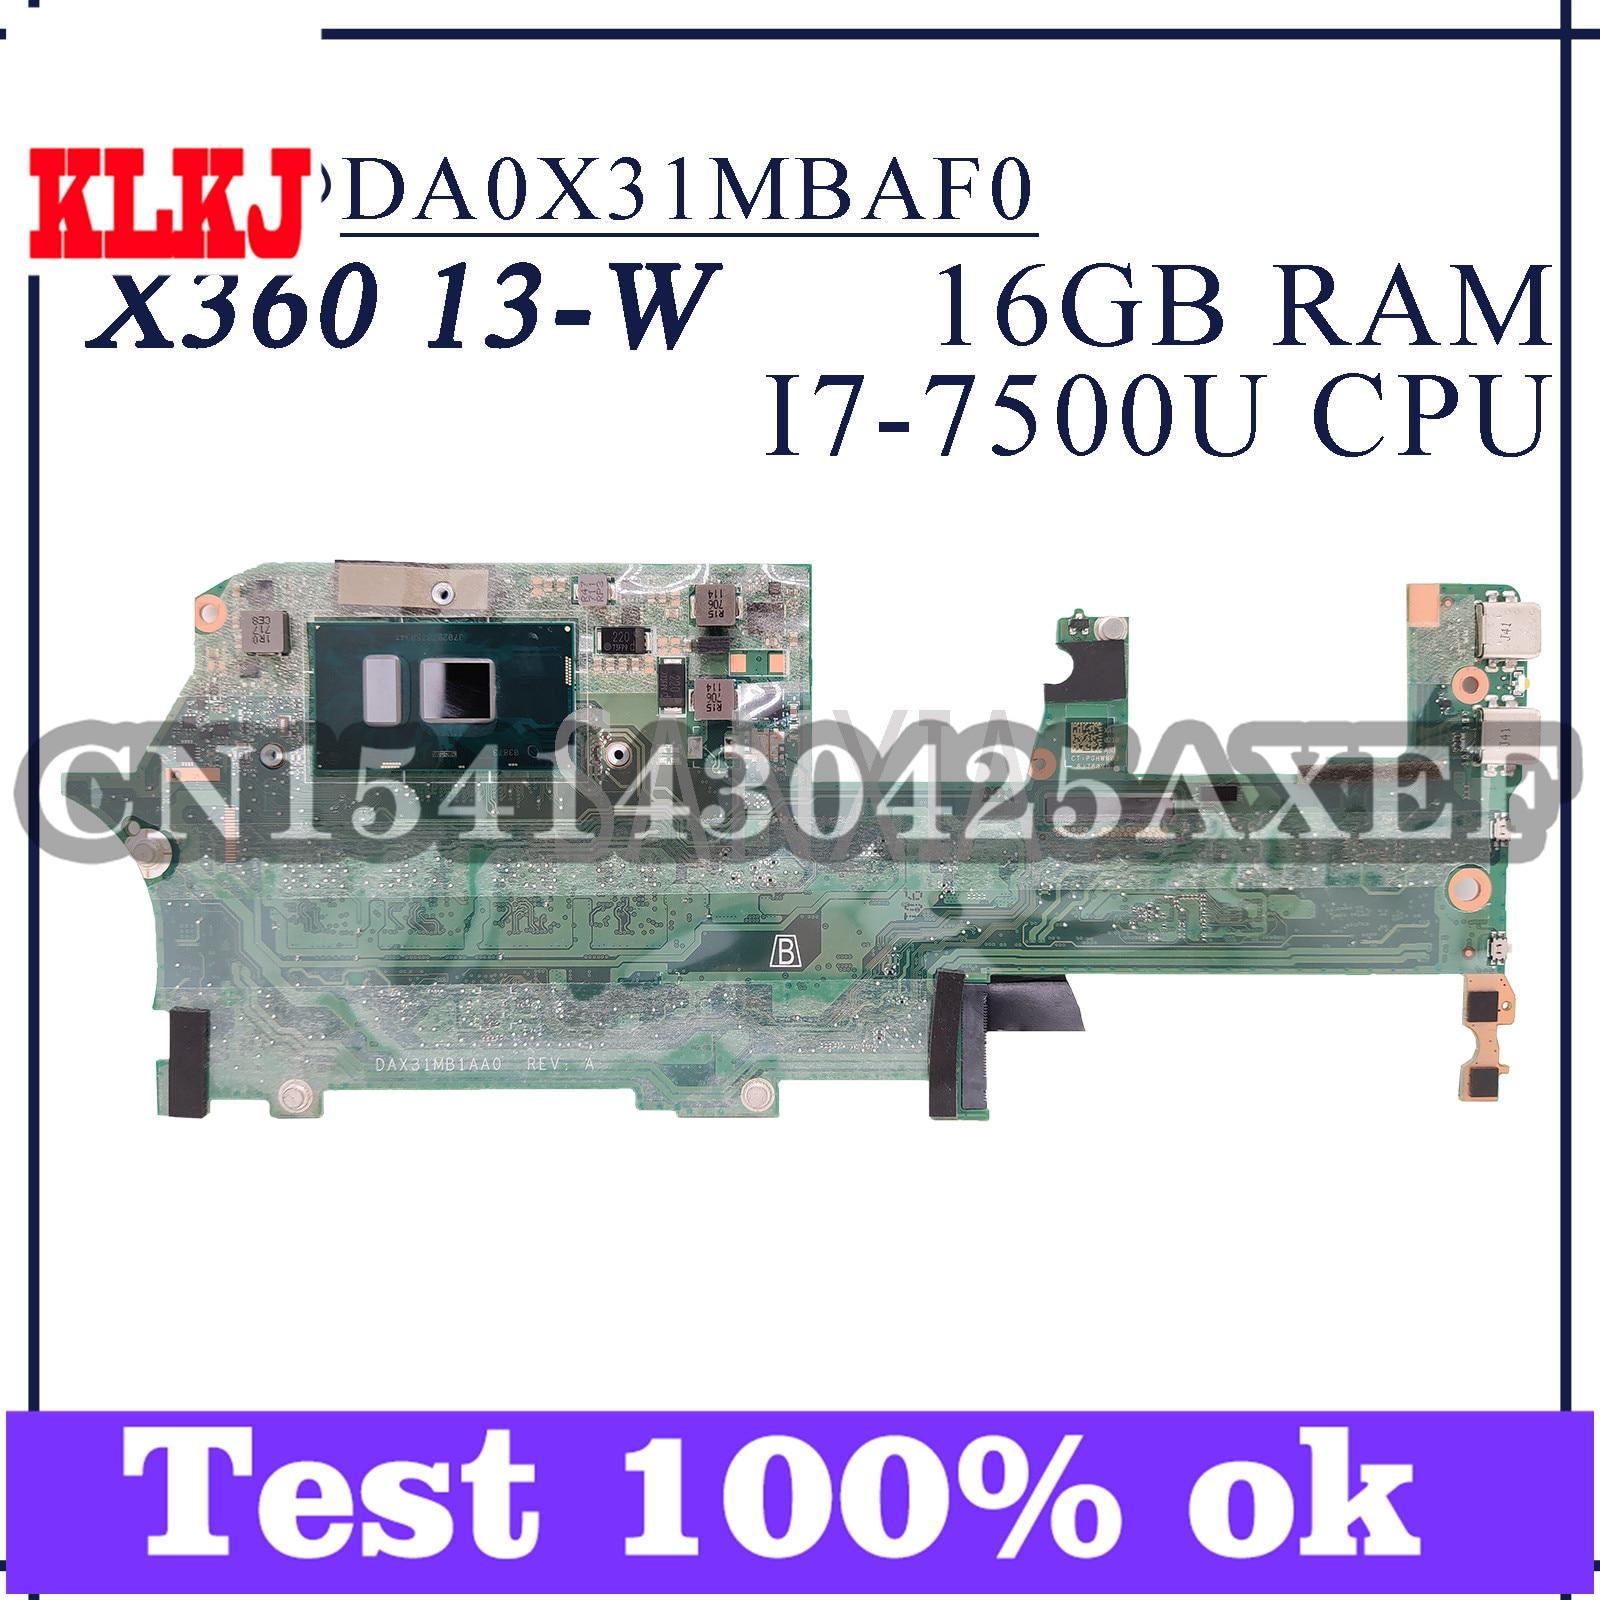 KLKJ DA0X31MBAF0 محمول لوحة رئيسية لأجهزة HP شبح X360 13-W اللوحة الأصلية 16GB-RAM I7-7500U 907560-601 907560-001